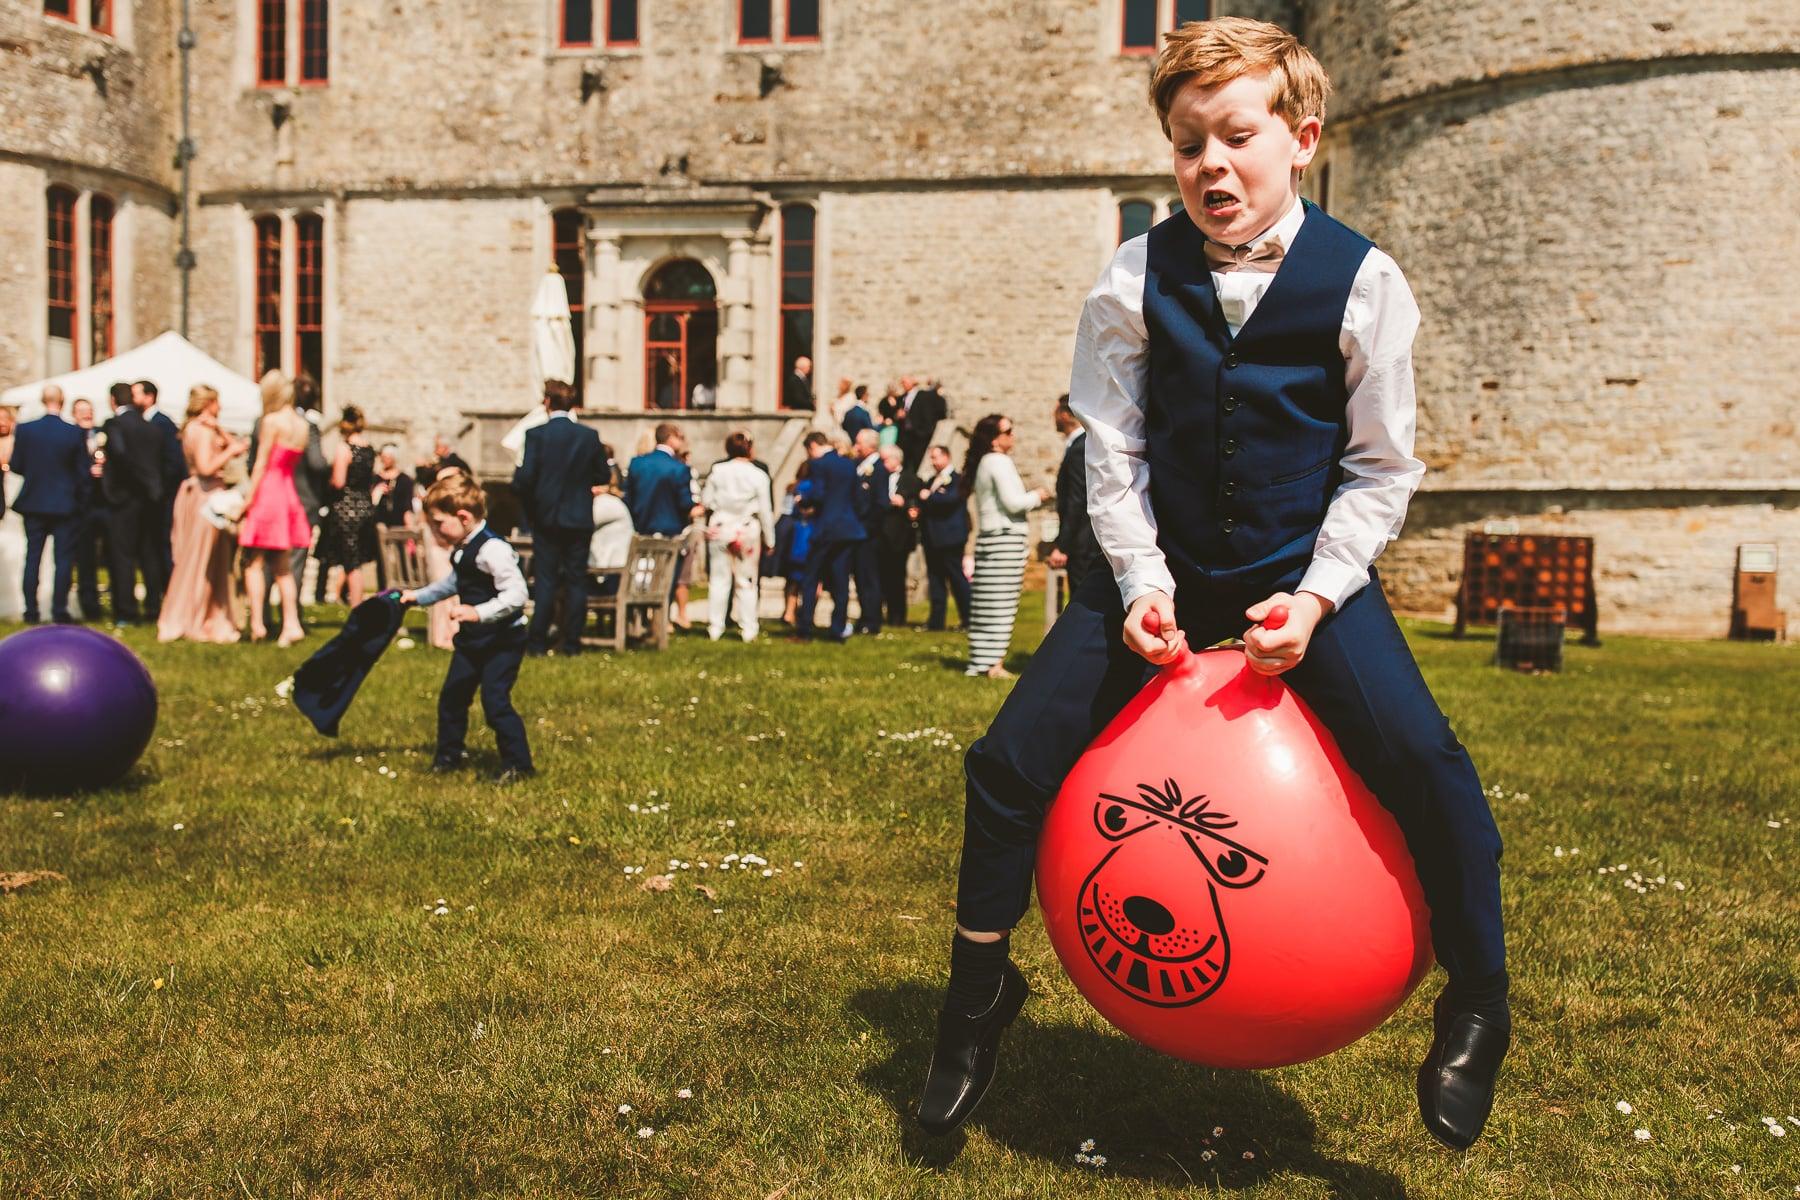 Lawn-games-Lulworth-Castle-wedding-photography